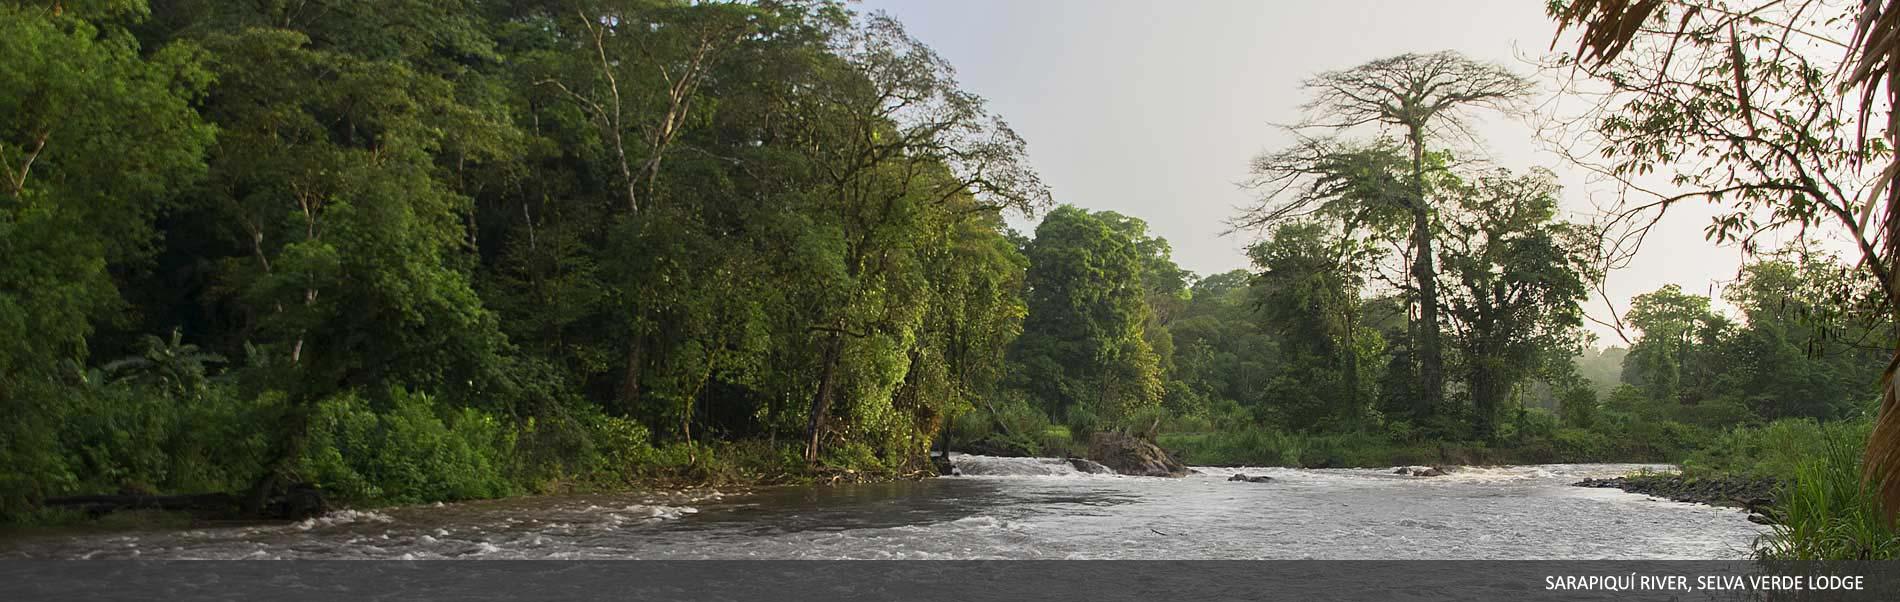 explore-costarica-02.jpg